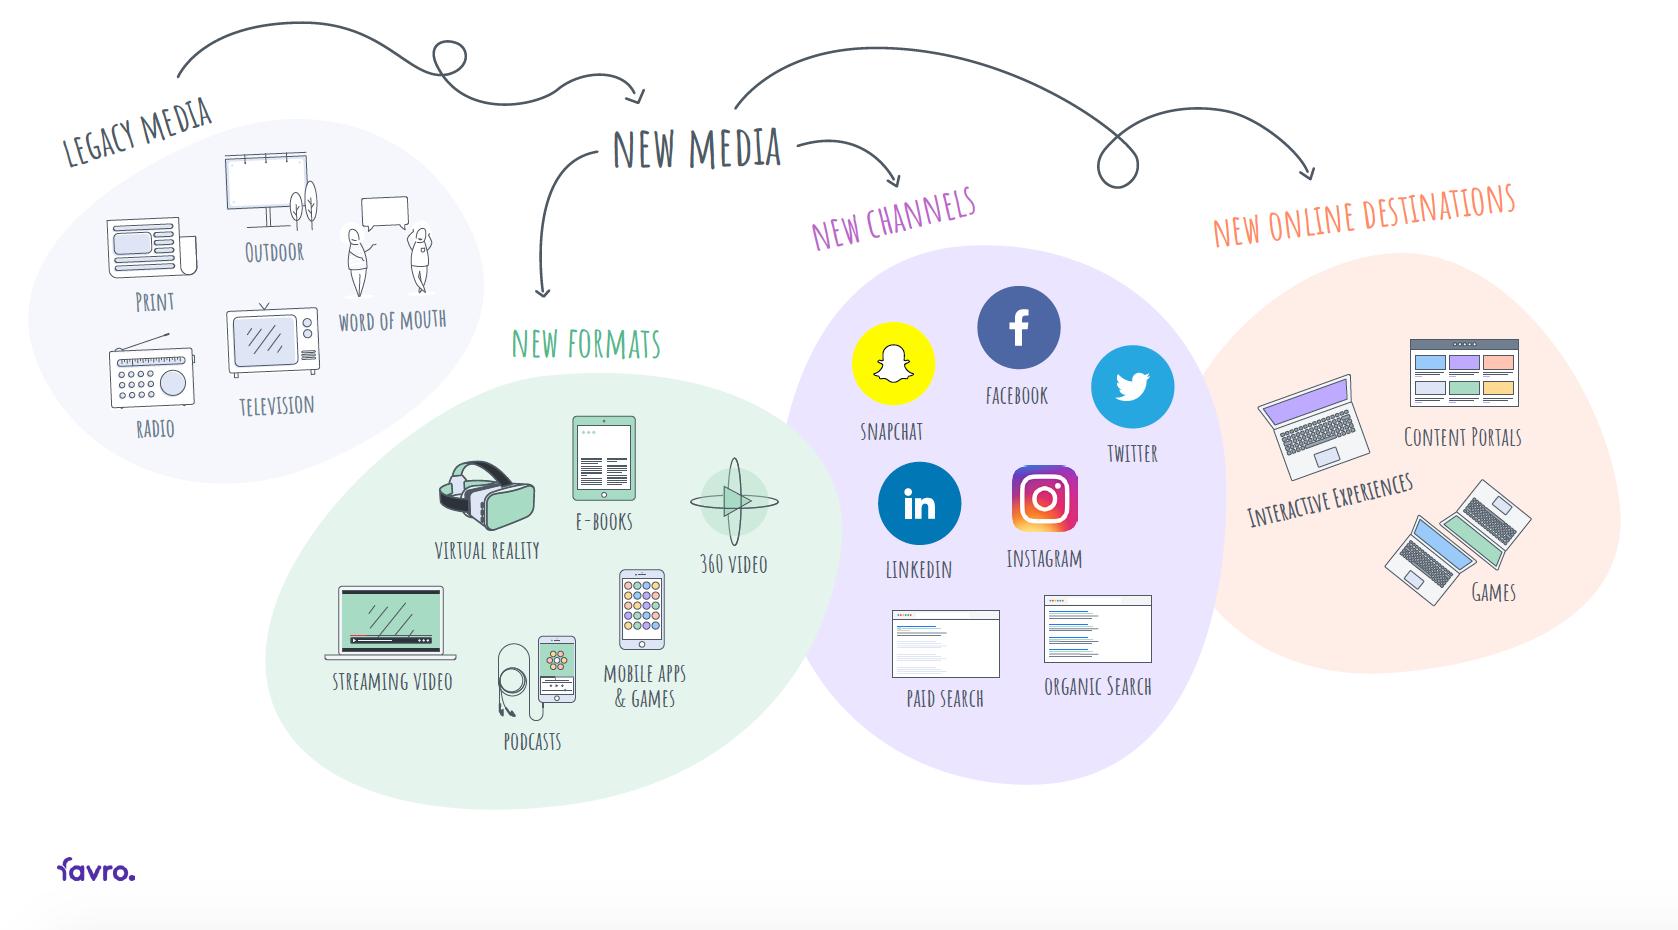 media landscape illustrated through bubbles